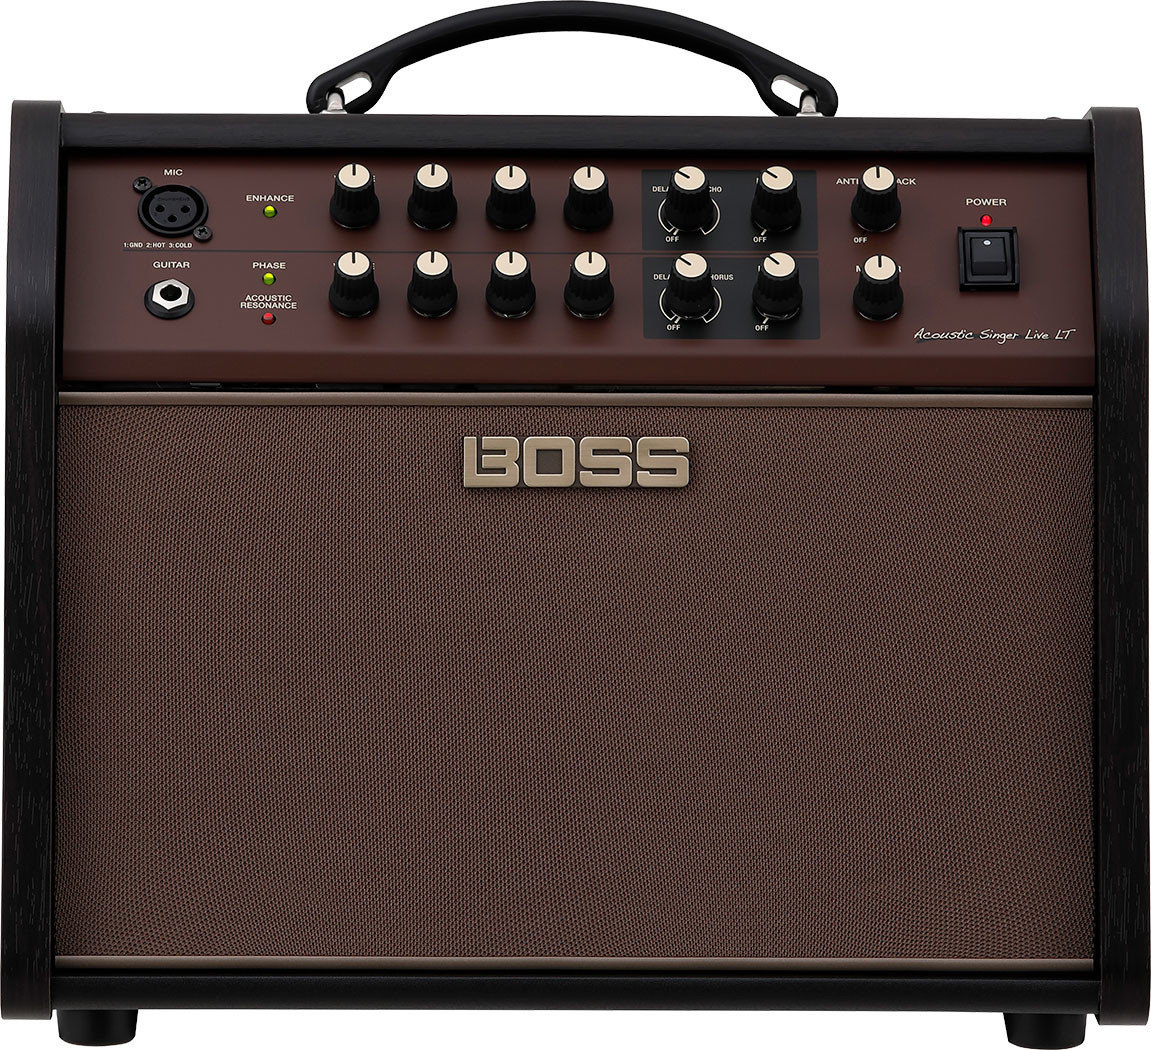 Image of Boss Acoustic Singer Live LT